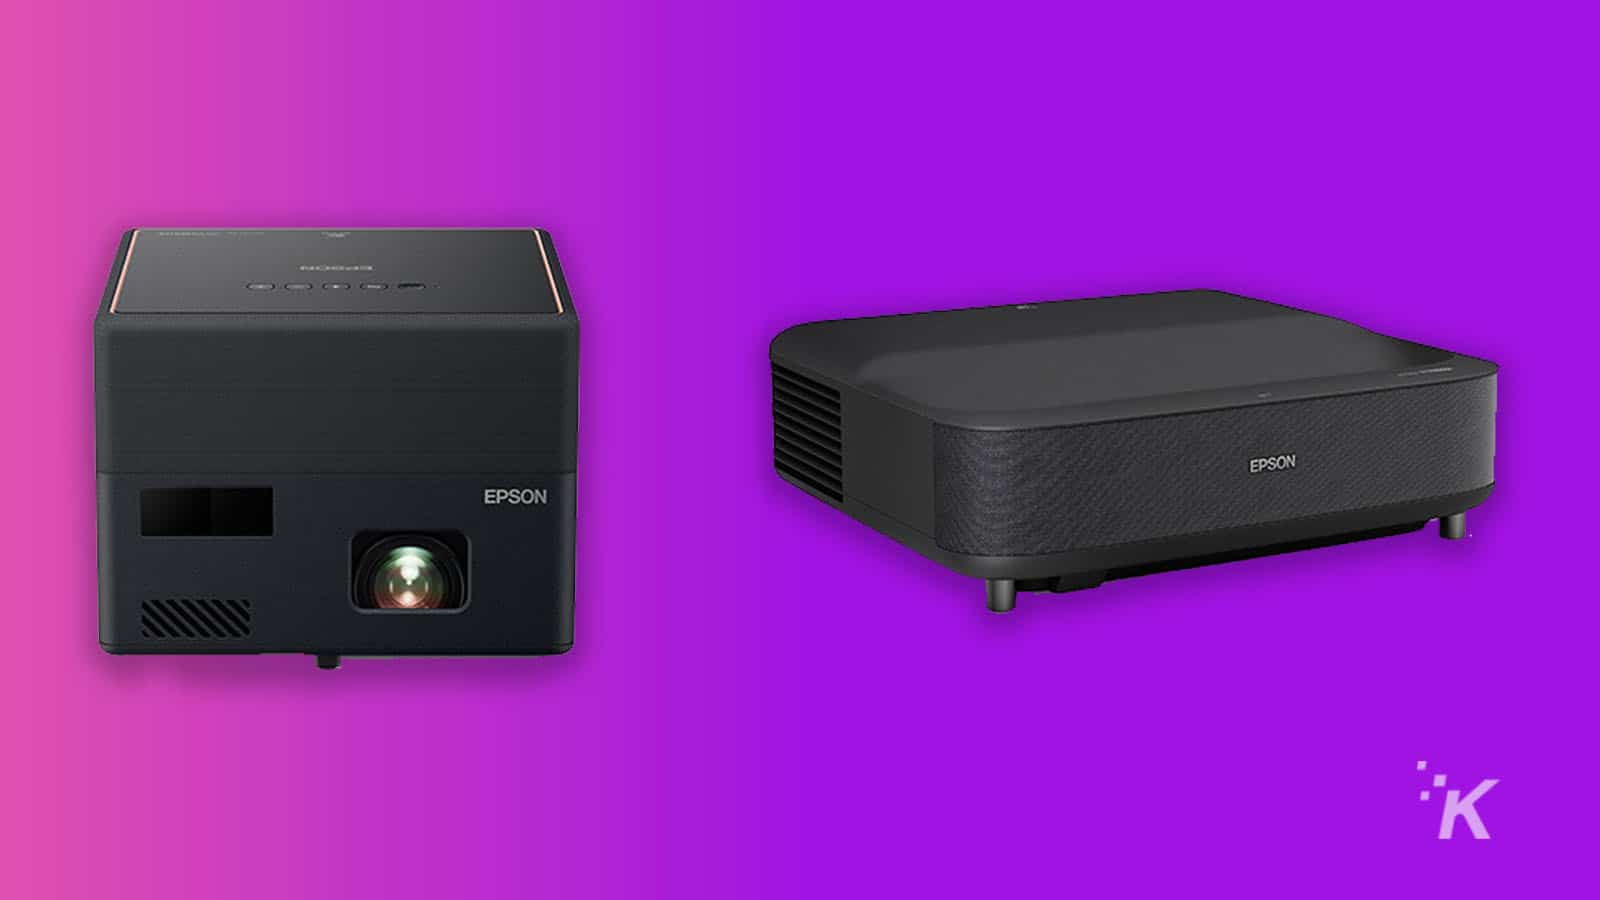 epson projectors both models